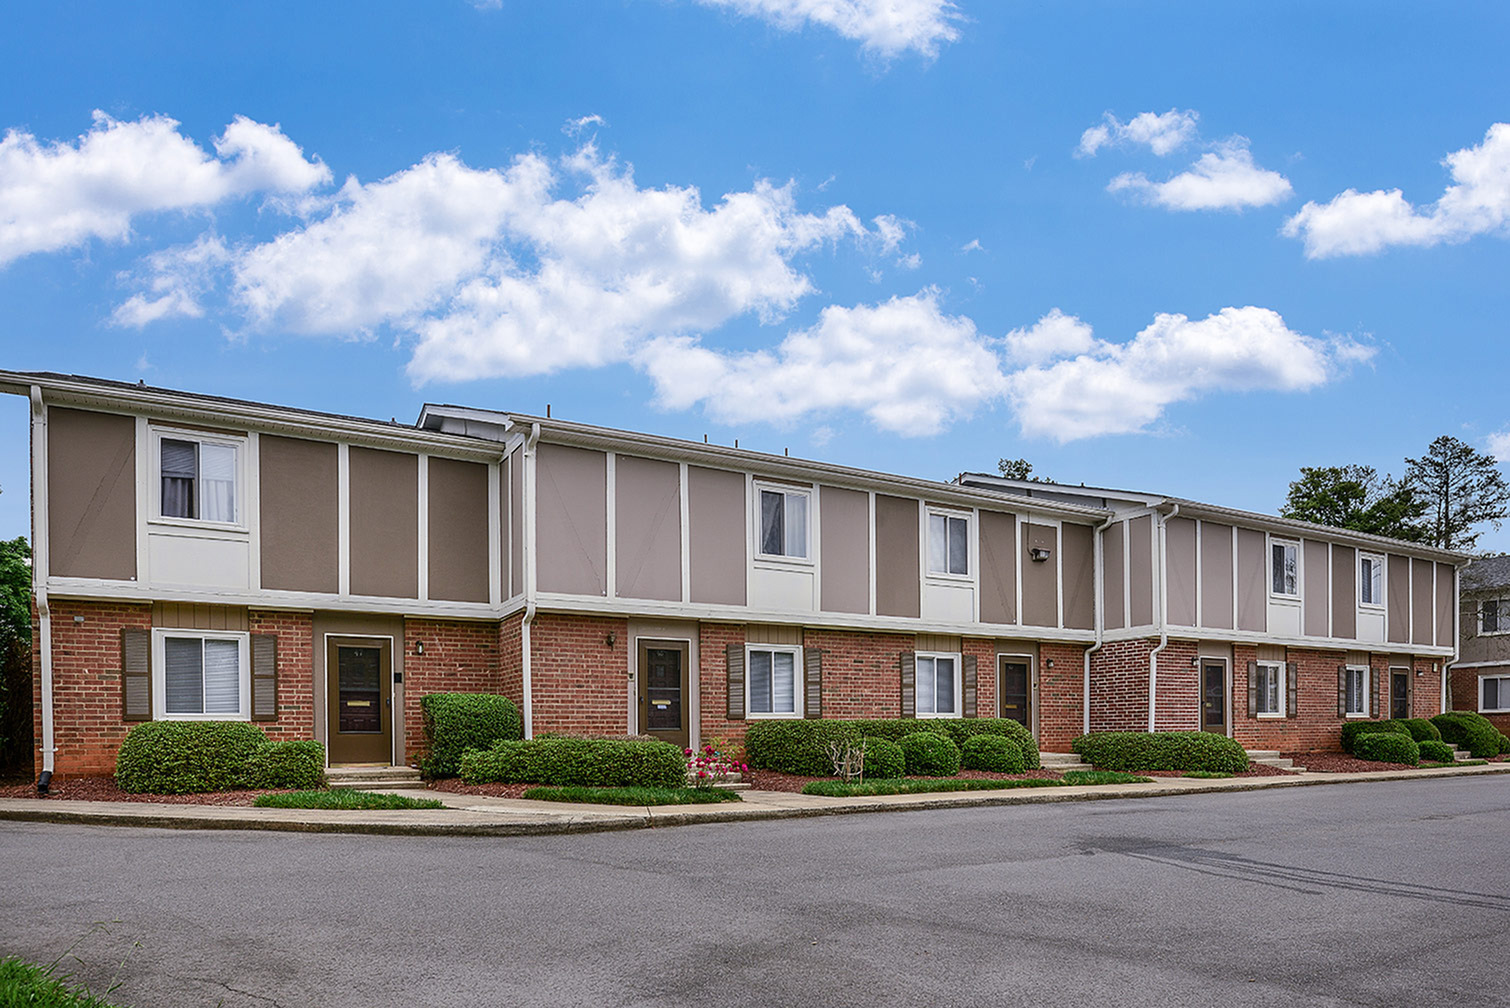 Private apartment entrances   Charlotte NC rentals